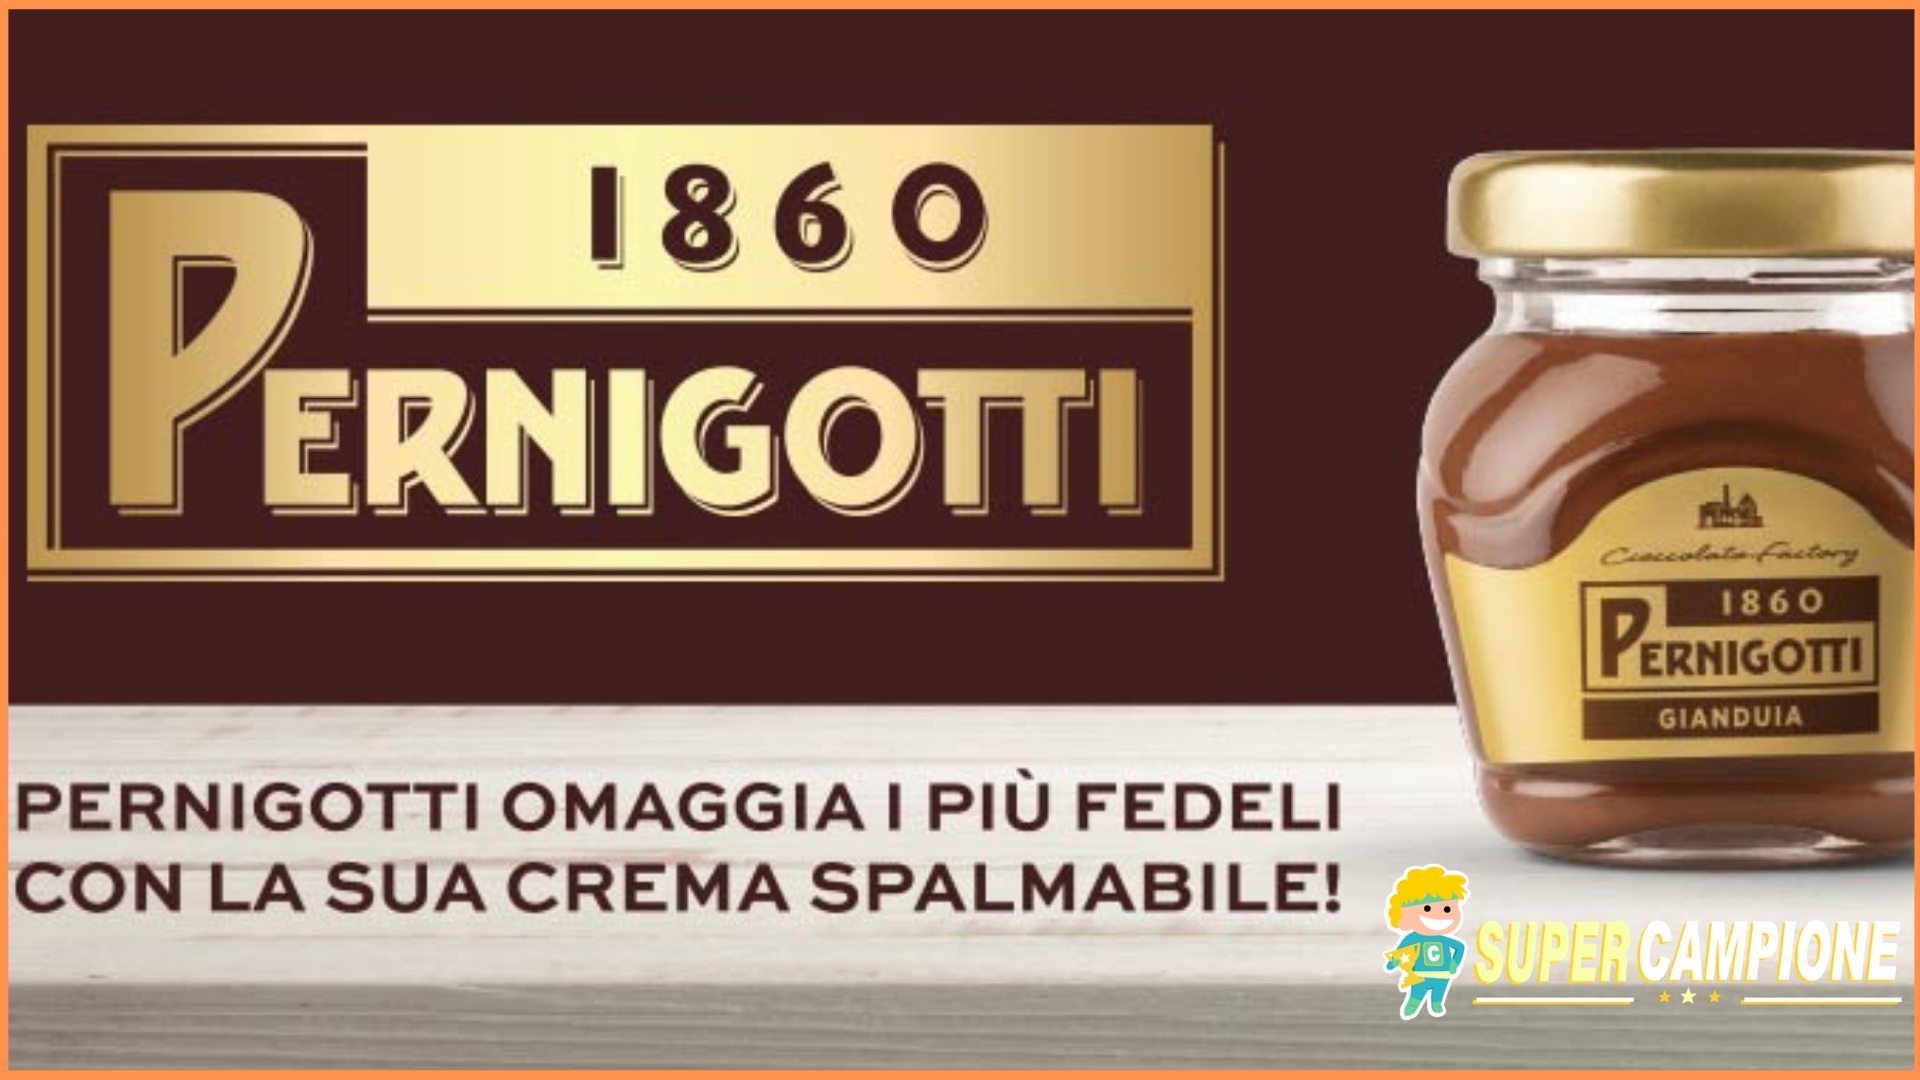 Campioni gratis Pernigotti per l'Eurochocolate 2018